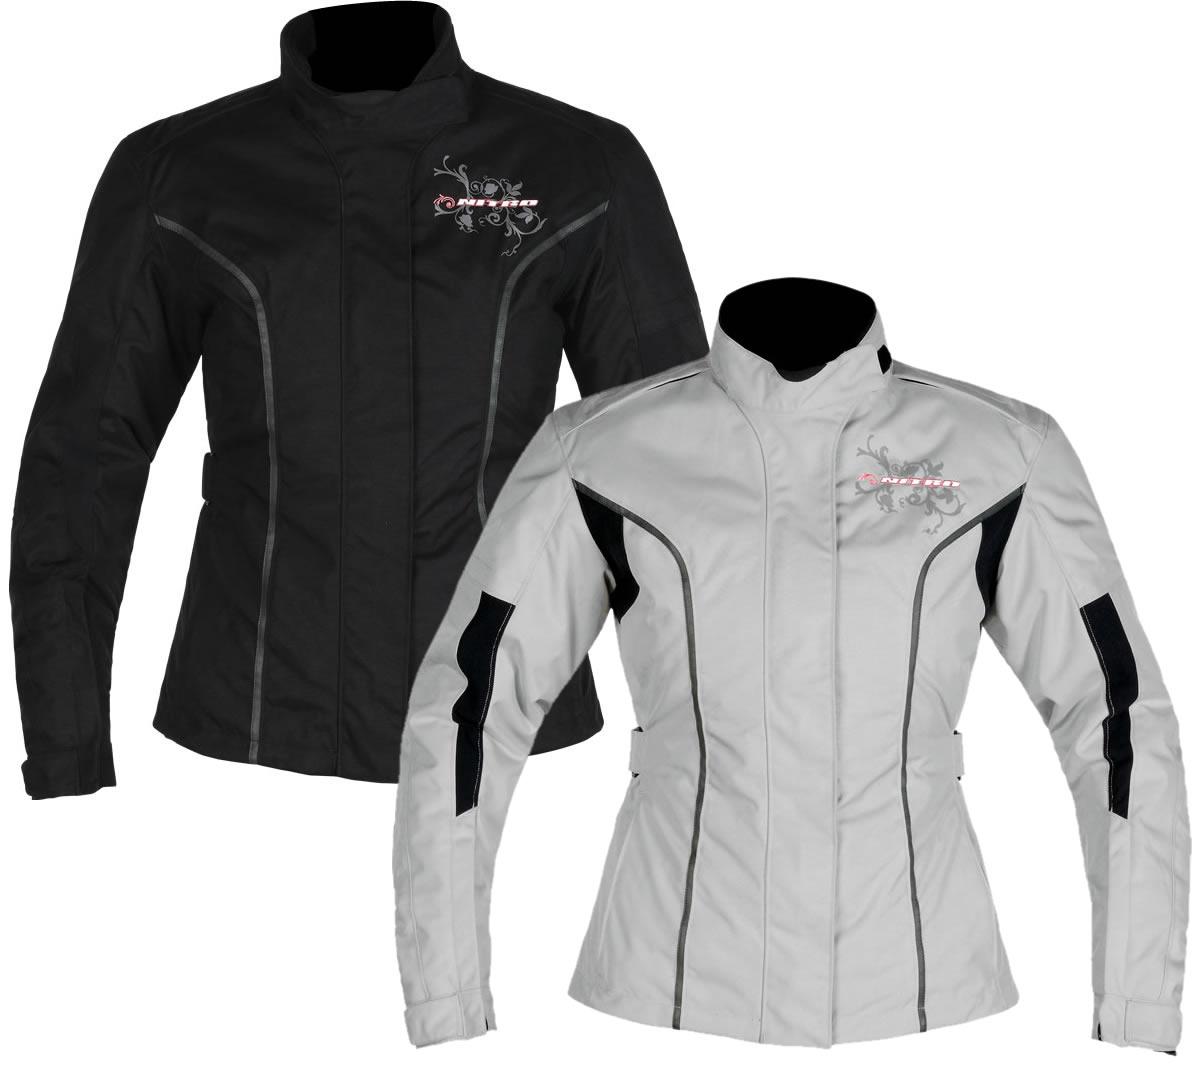 Womens motorbike jacket